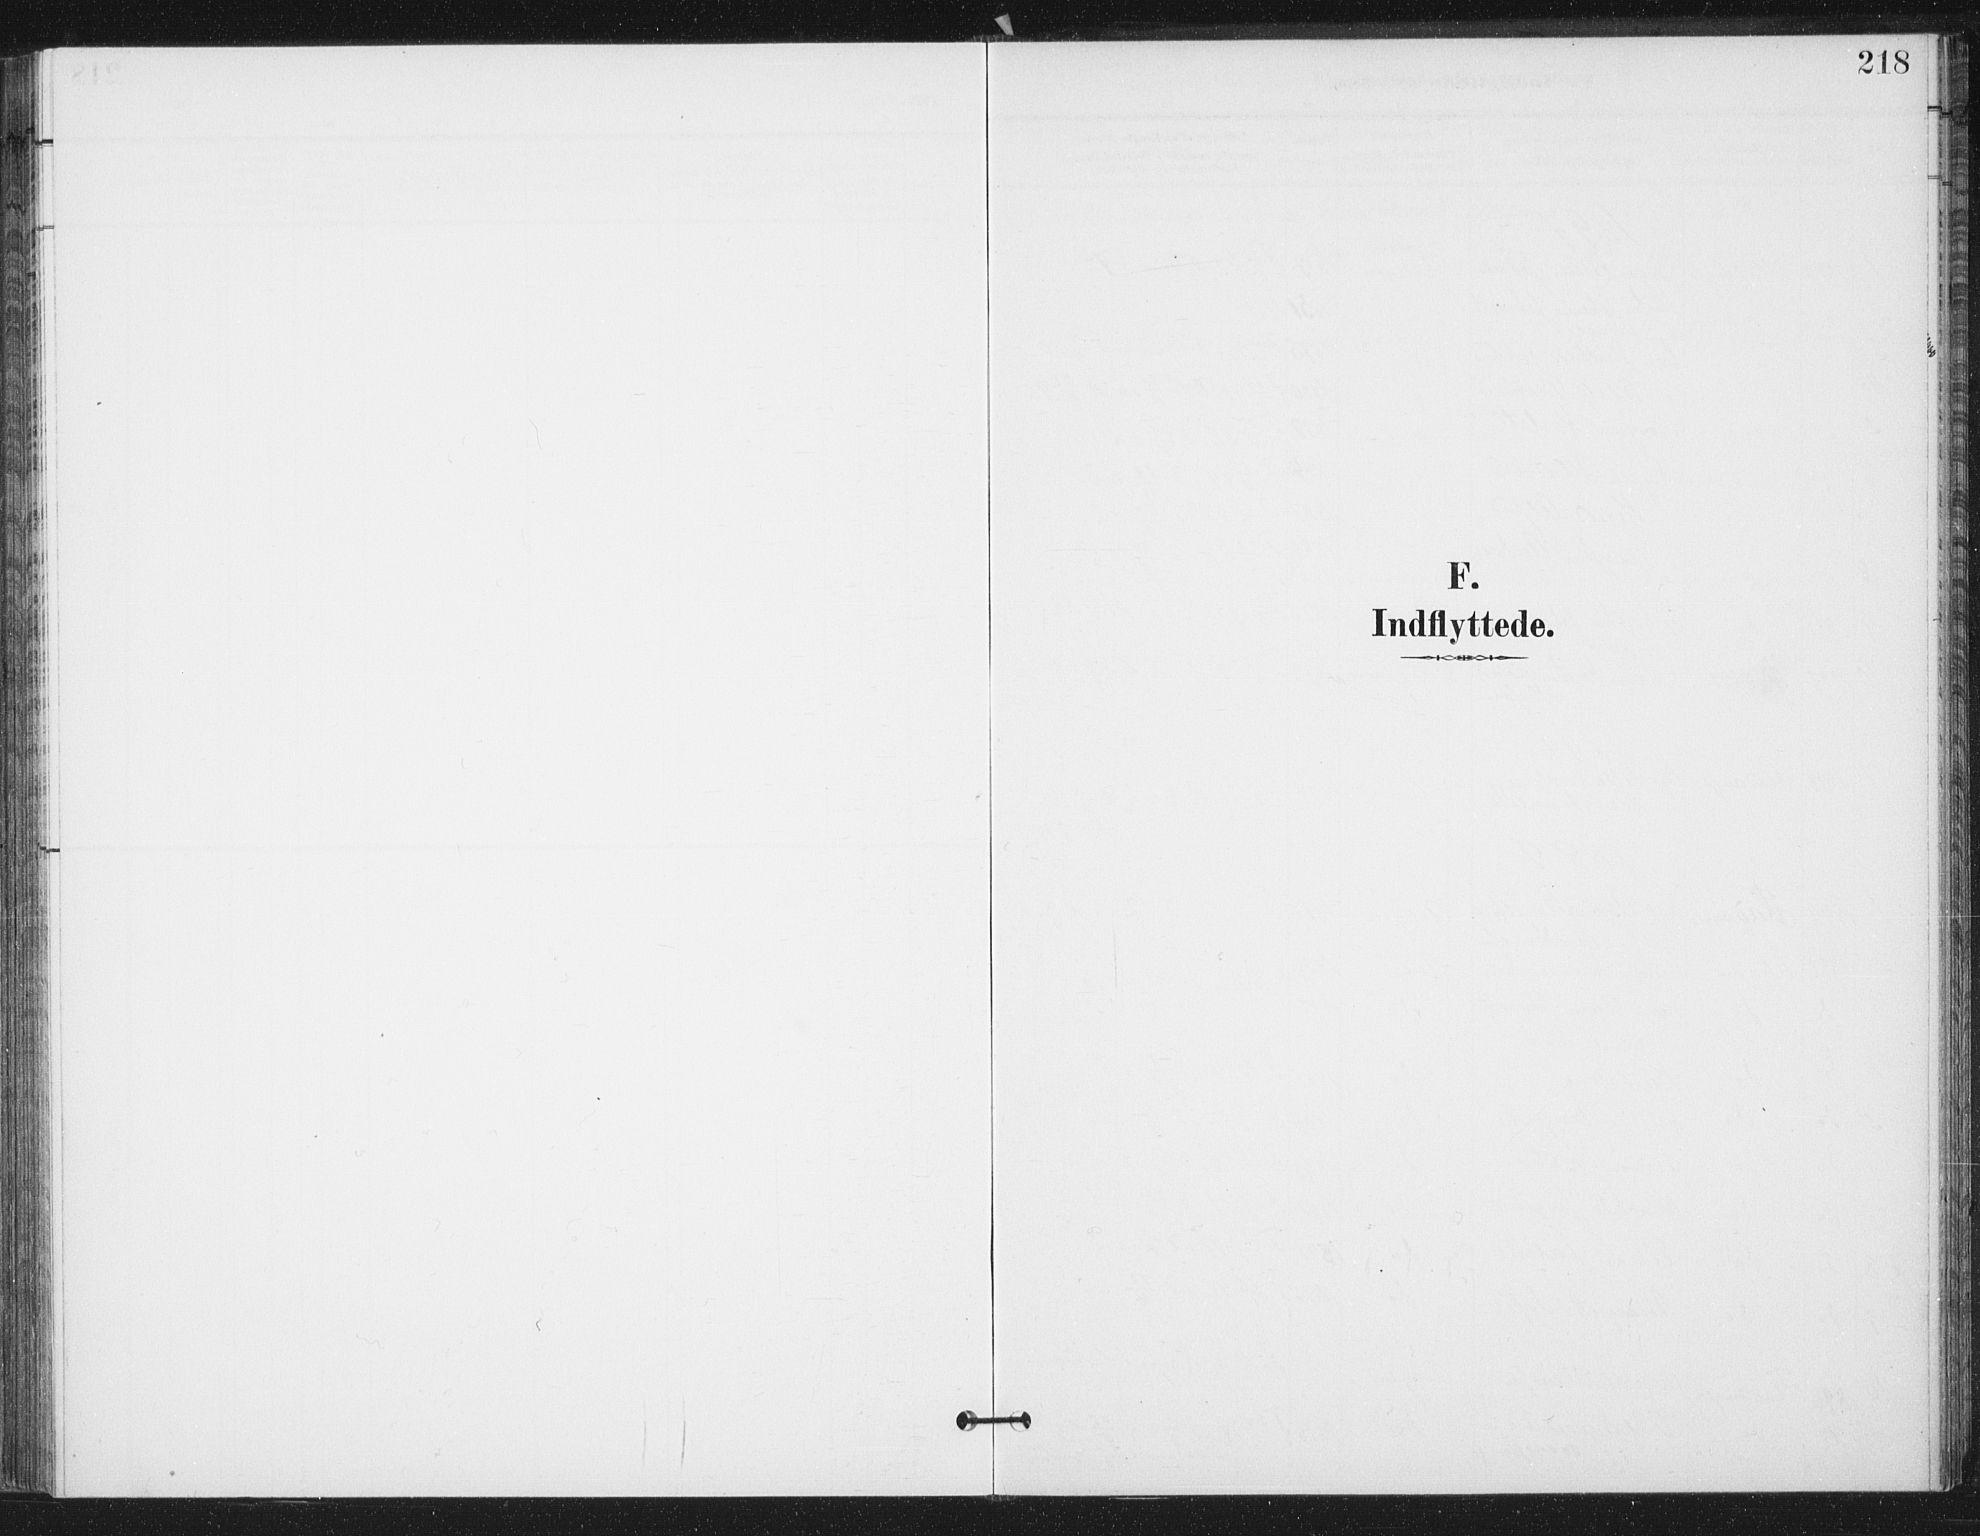 SAT, Ministerialprotokoller, klokkerbøker og fødselsregistre - Sør-Trøndelag, 658/L0723: Parish register (official) no. 658A02, 1897-1912, p. 218